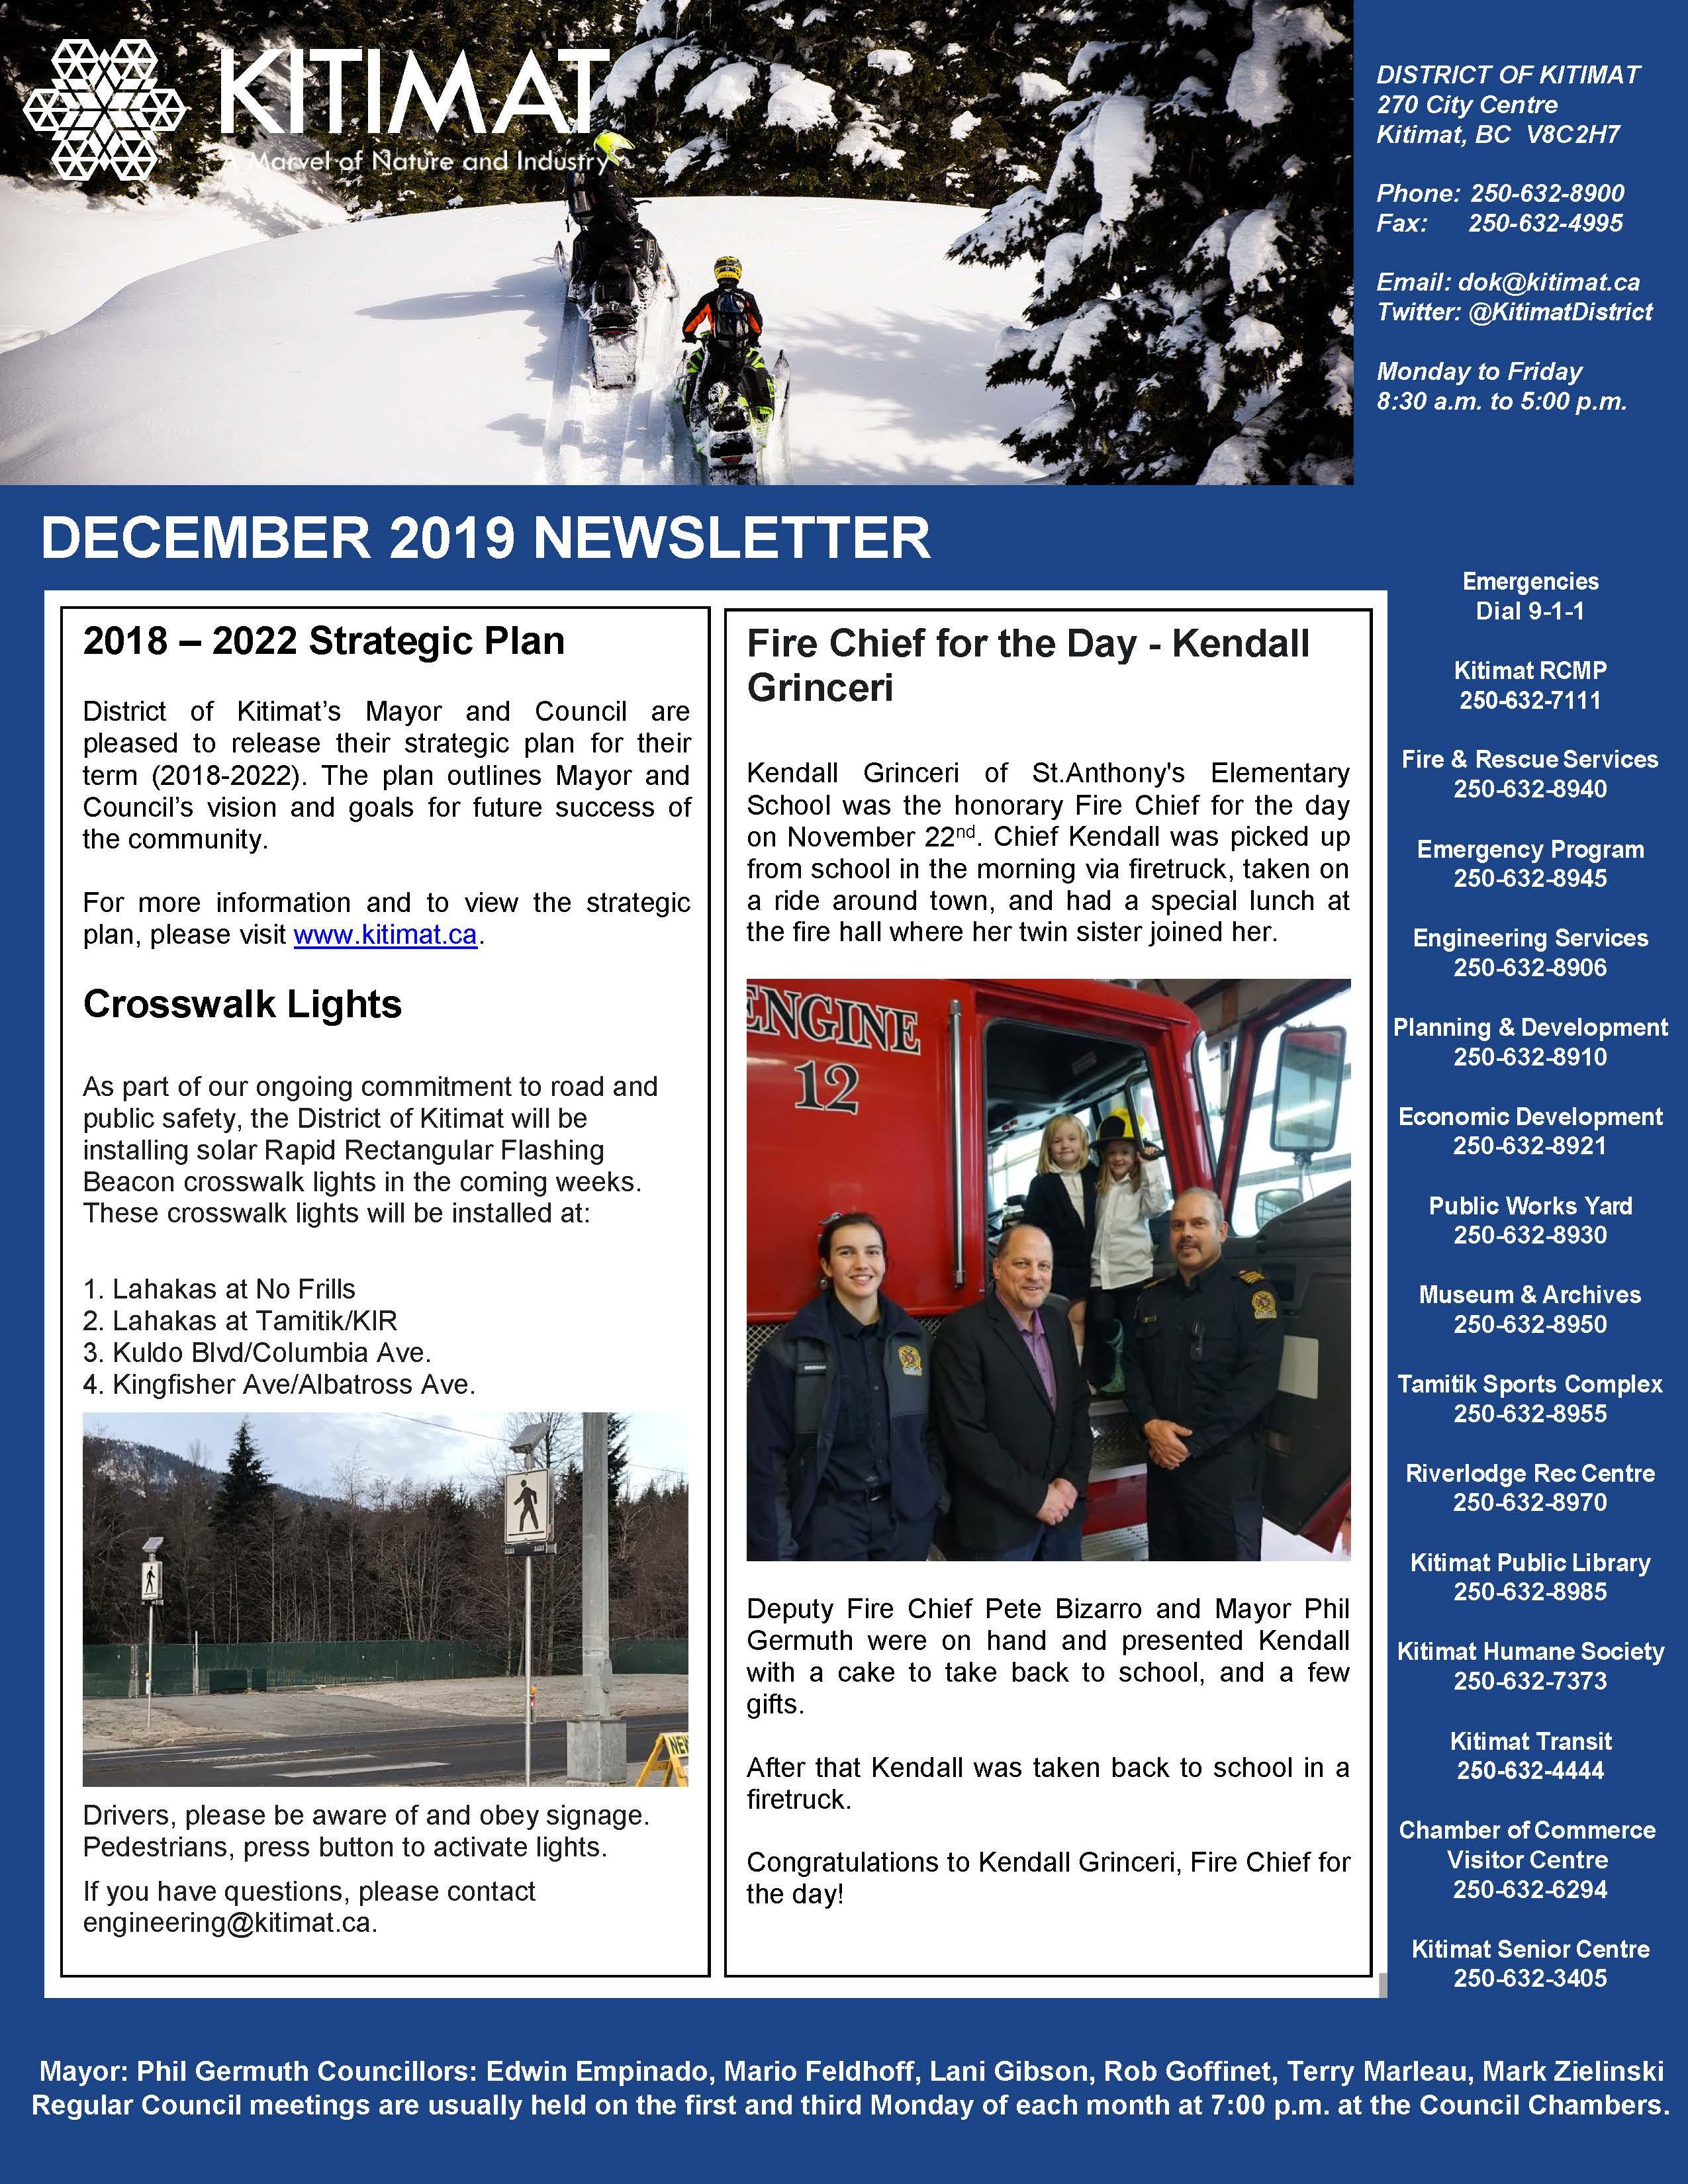 Dec 2019 DOK Newsletter, pg 1 of 2